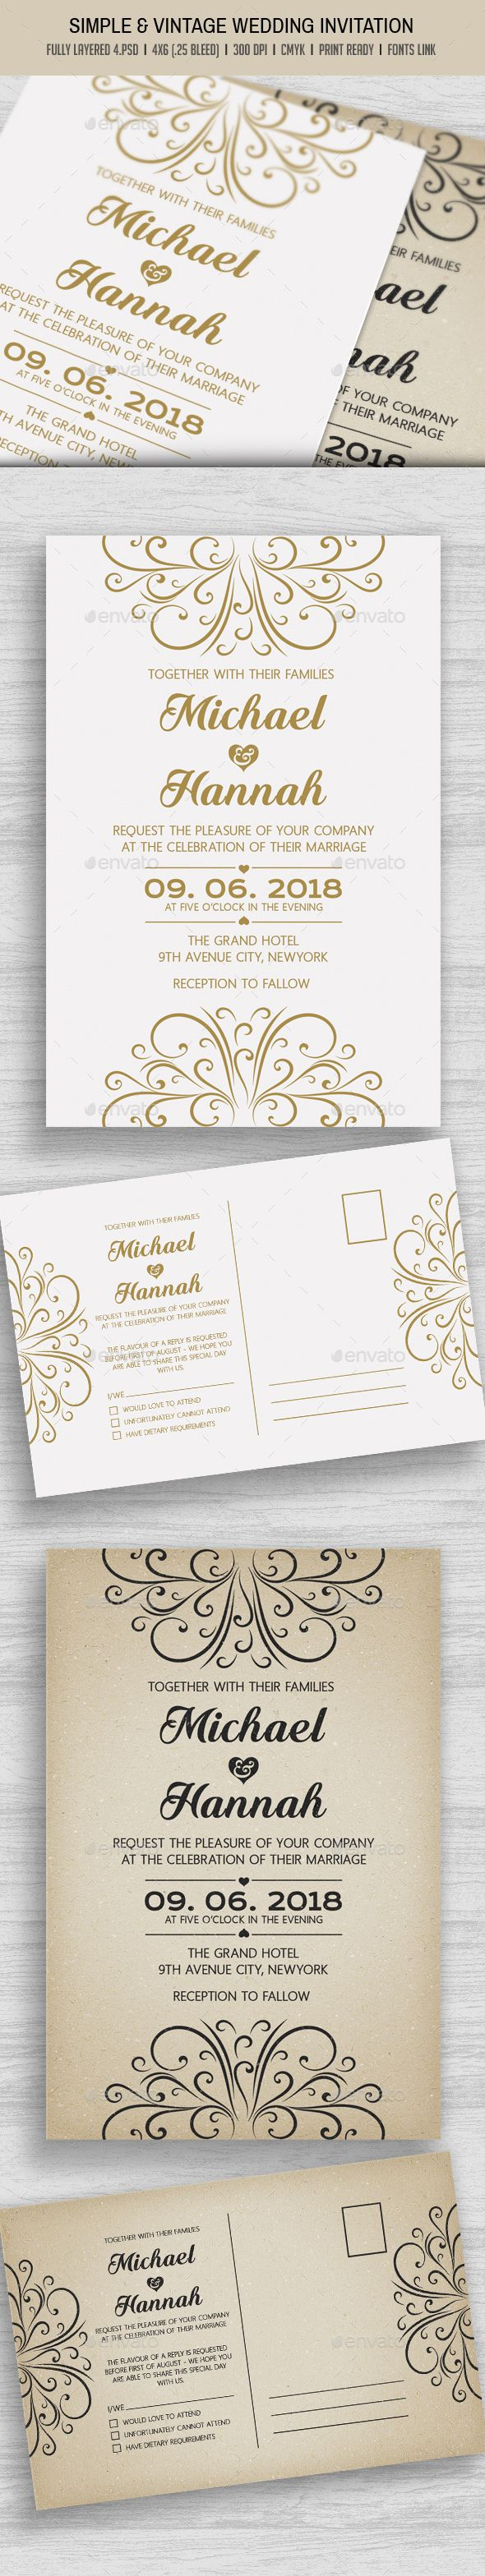 Simple vintage wedding invitation stopboris Image collections